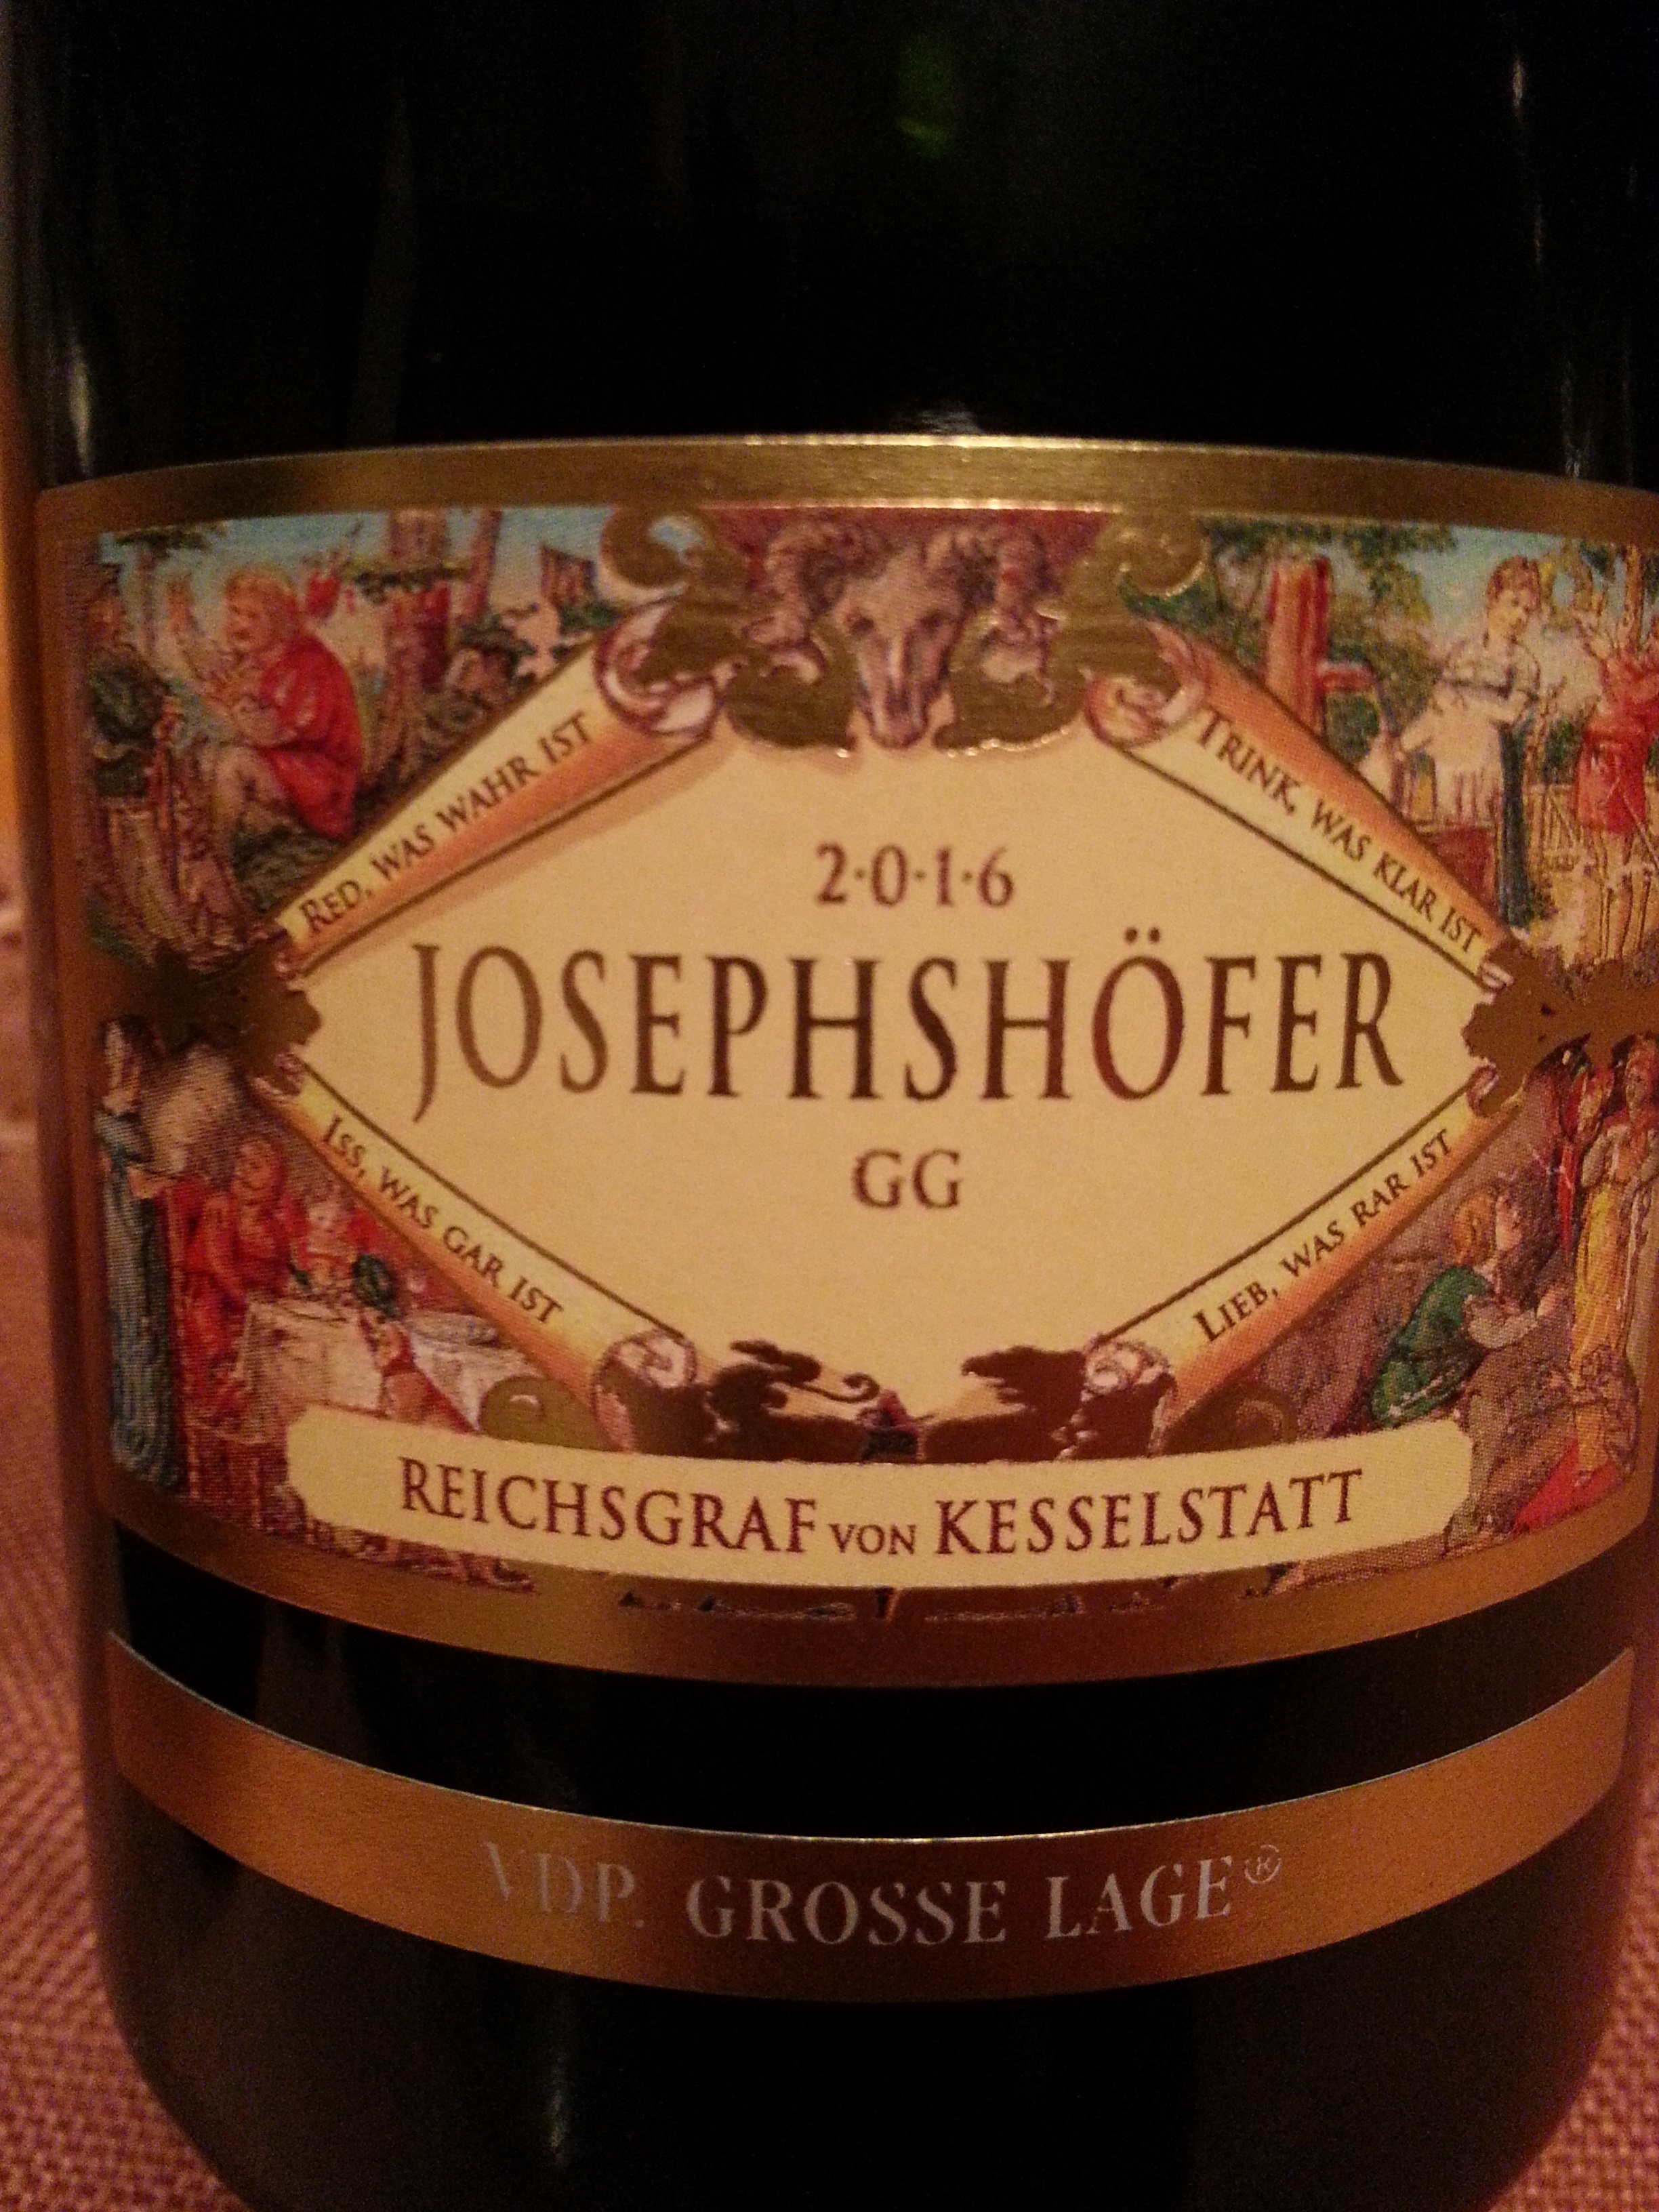 2016 Riesling Josephshöfer GG | Kesselstatt